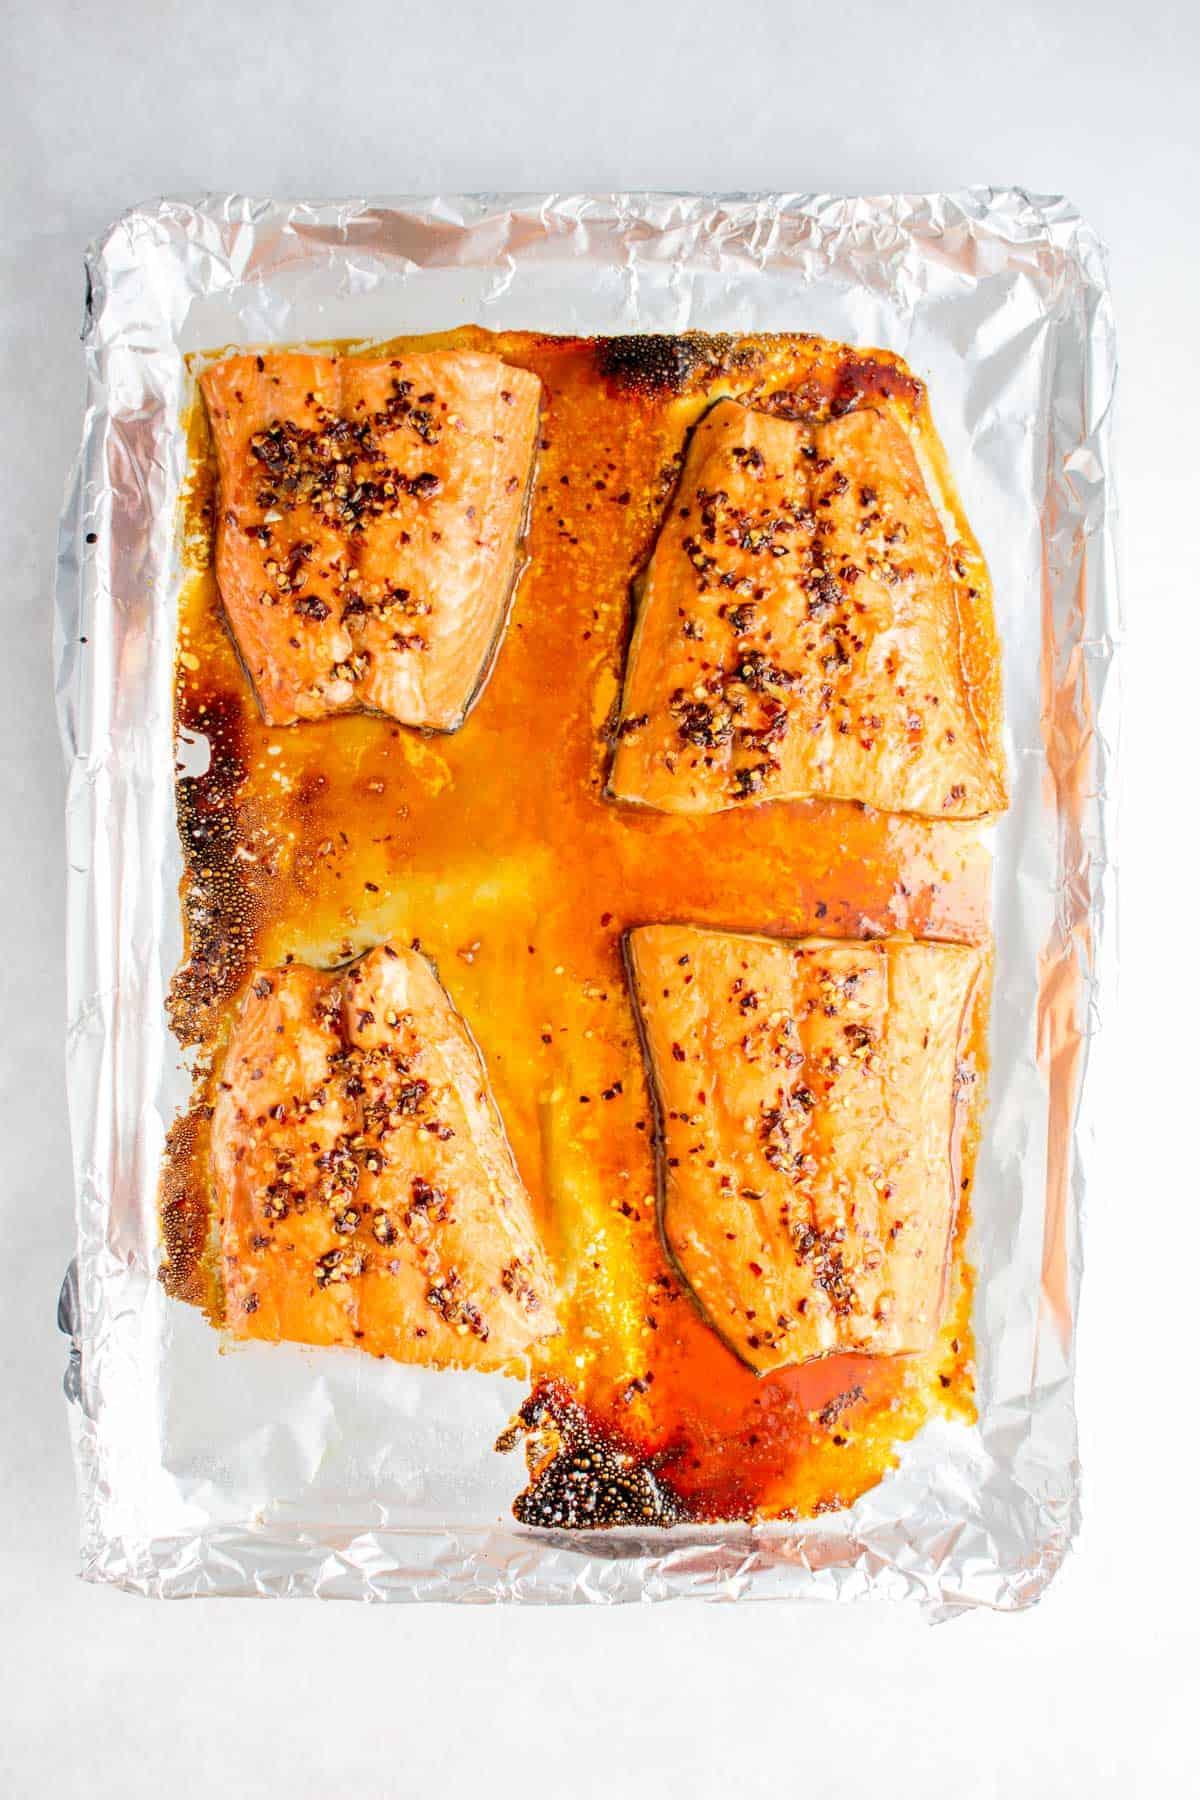 Baked sweet chili salmon on a sheet pan.